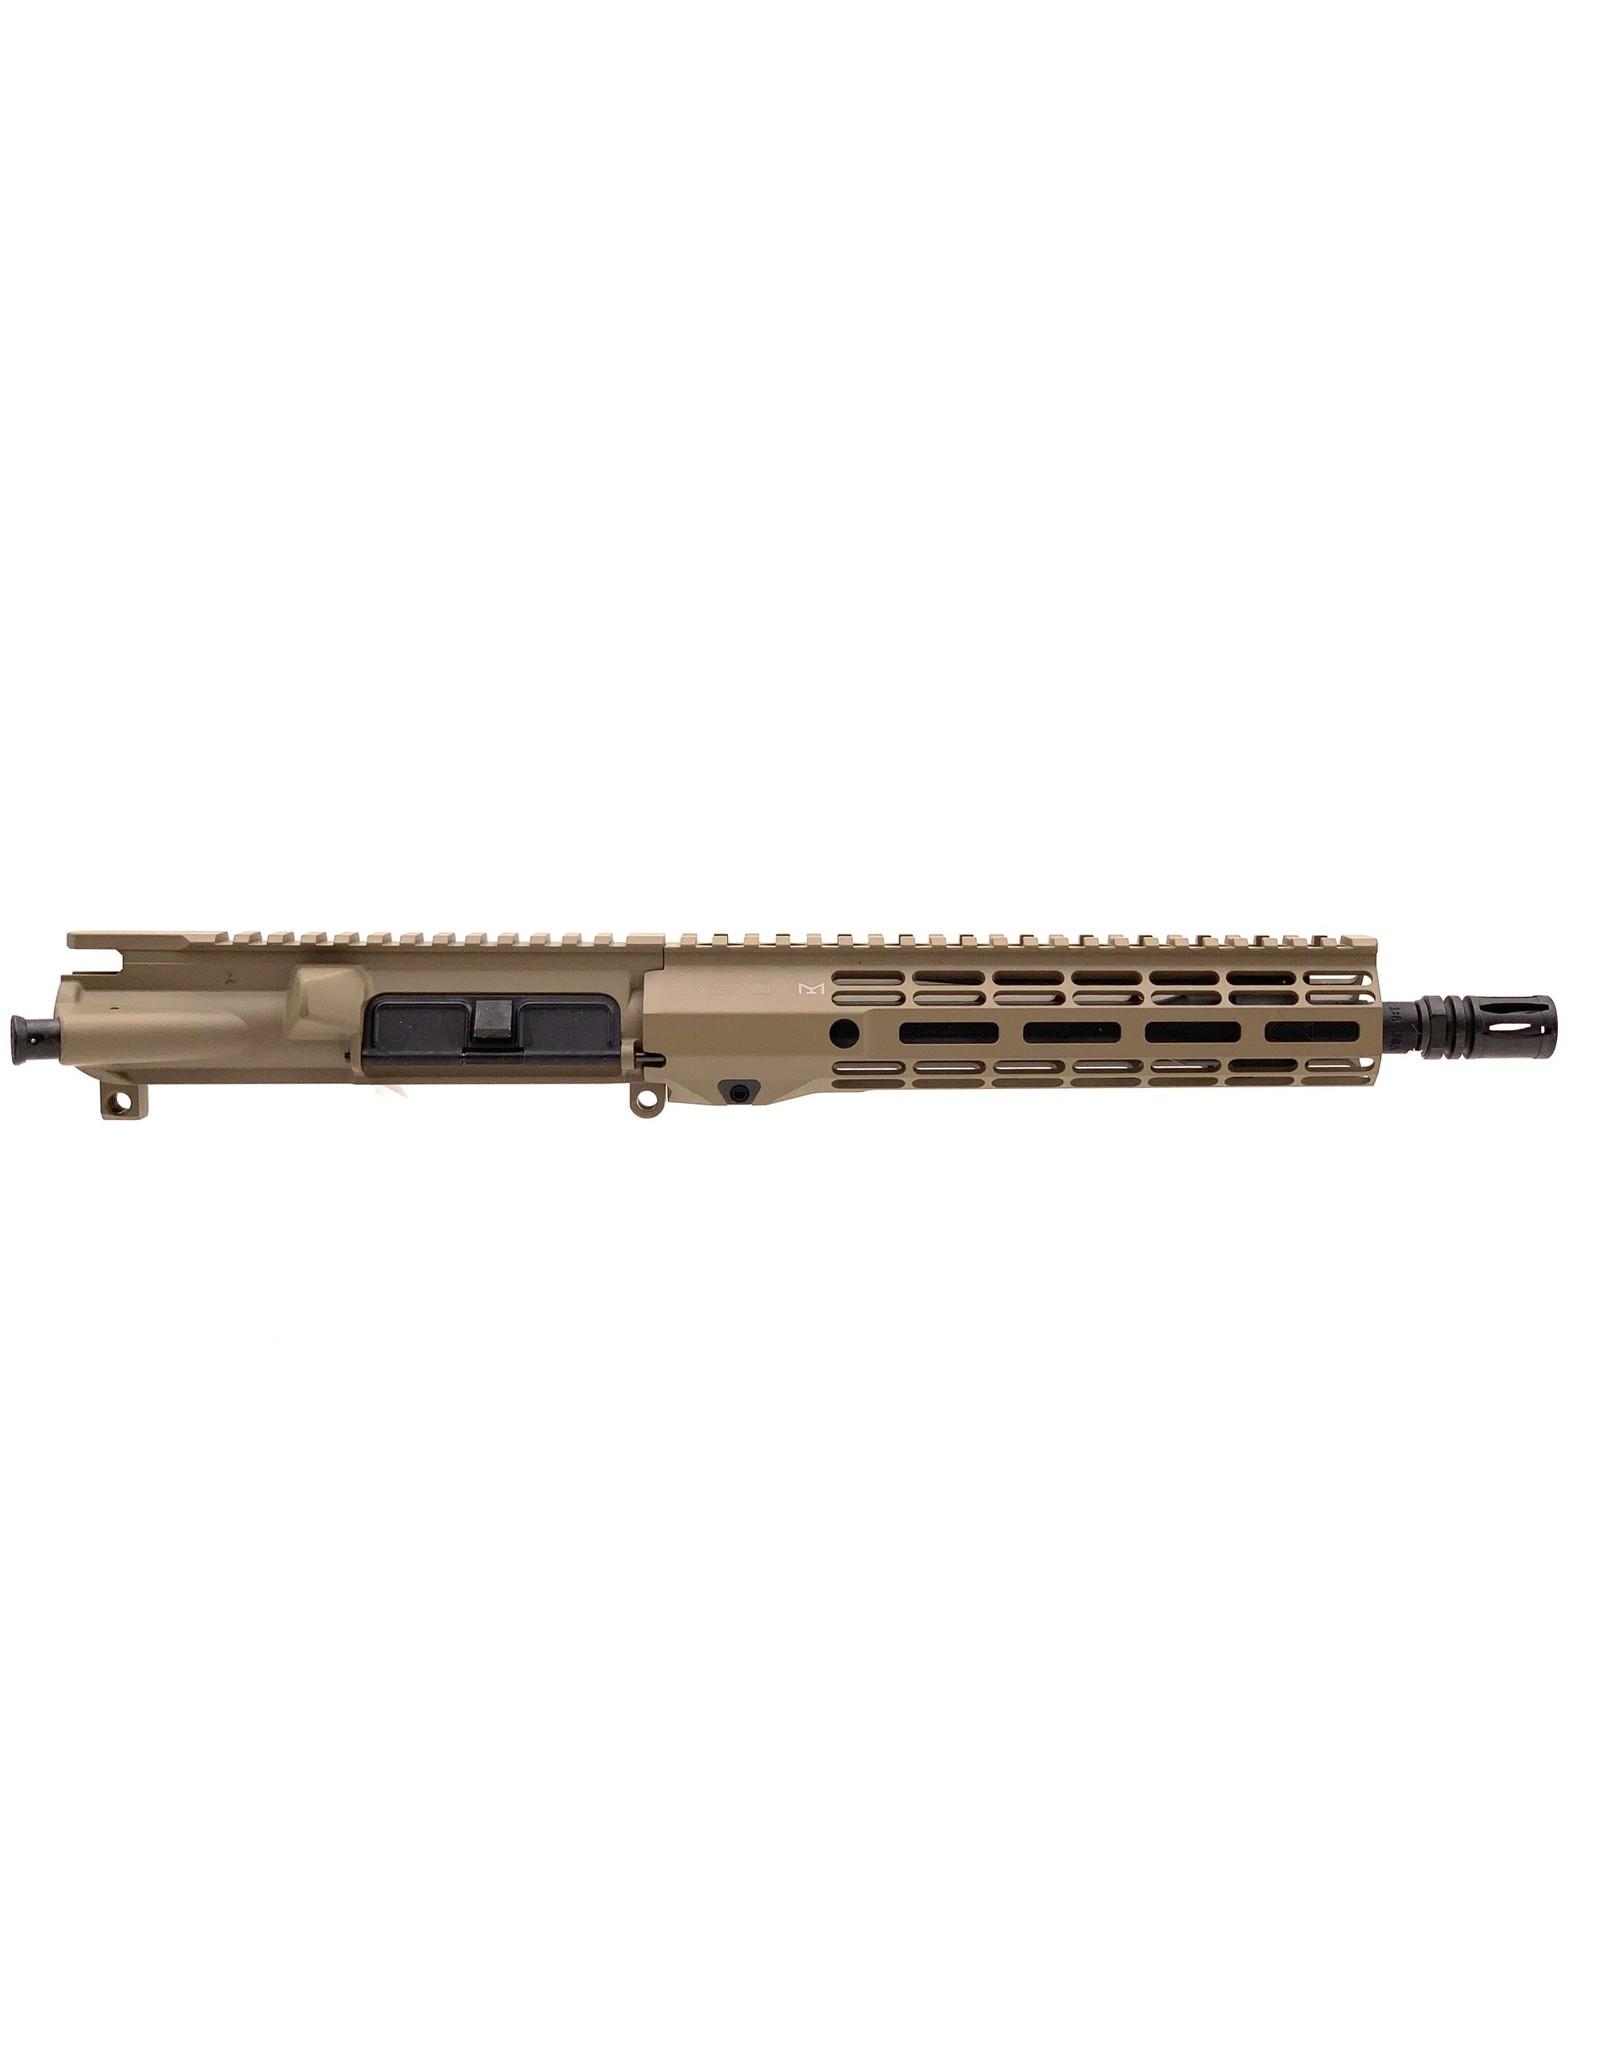 "Sam Diego Tactical 10.5"" .223 Wylde Complete Upper - FDE Cerakote"